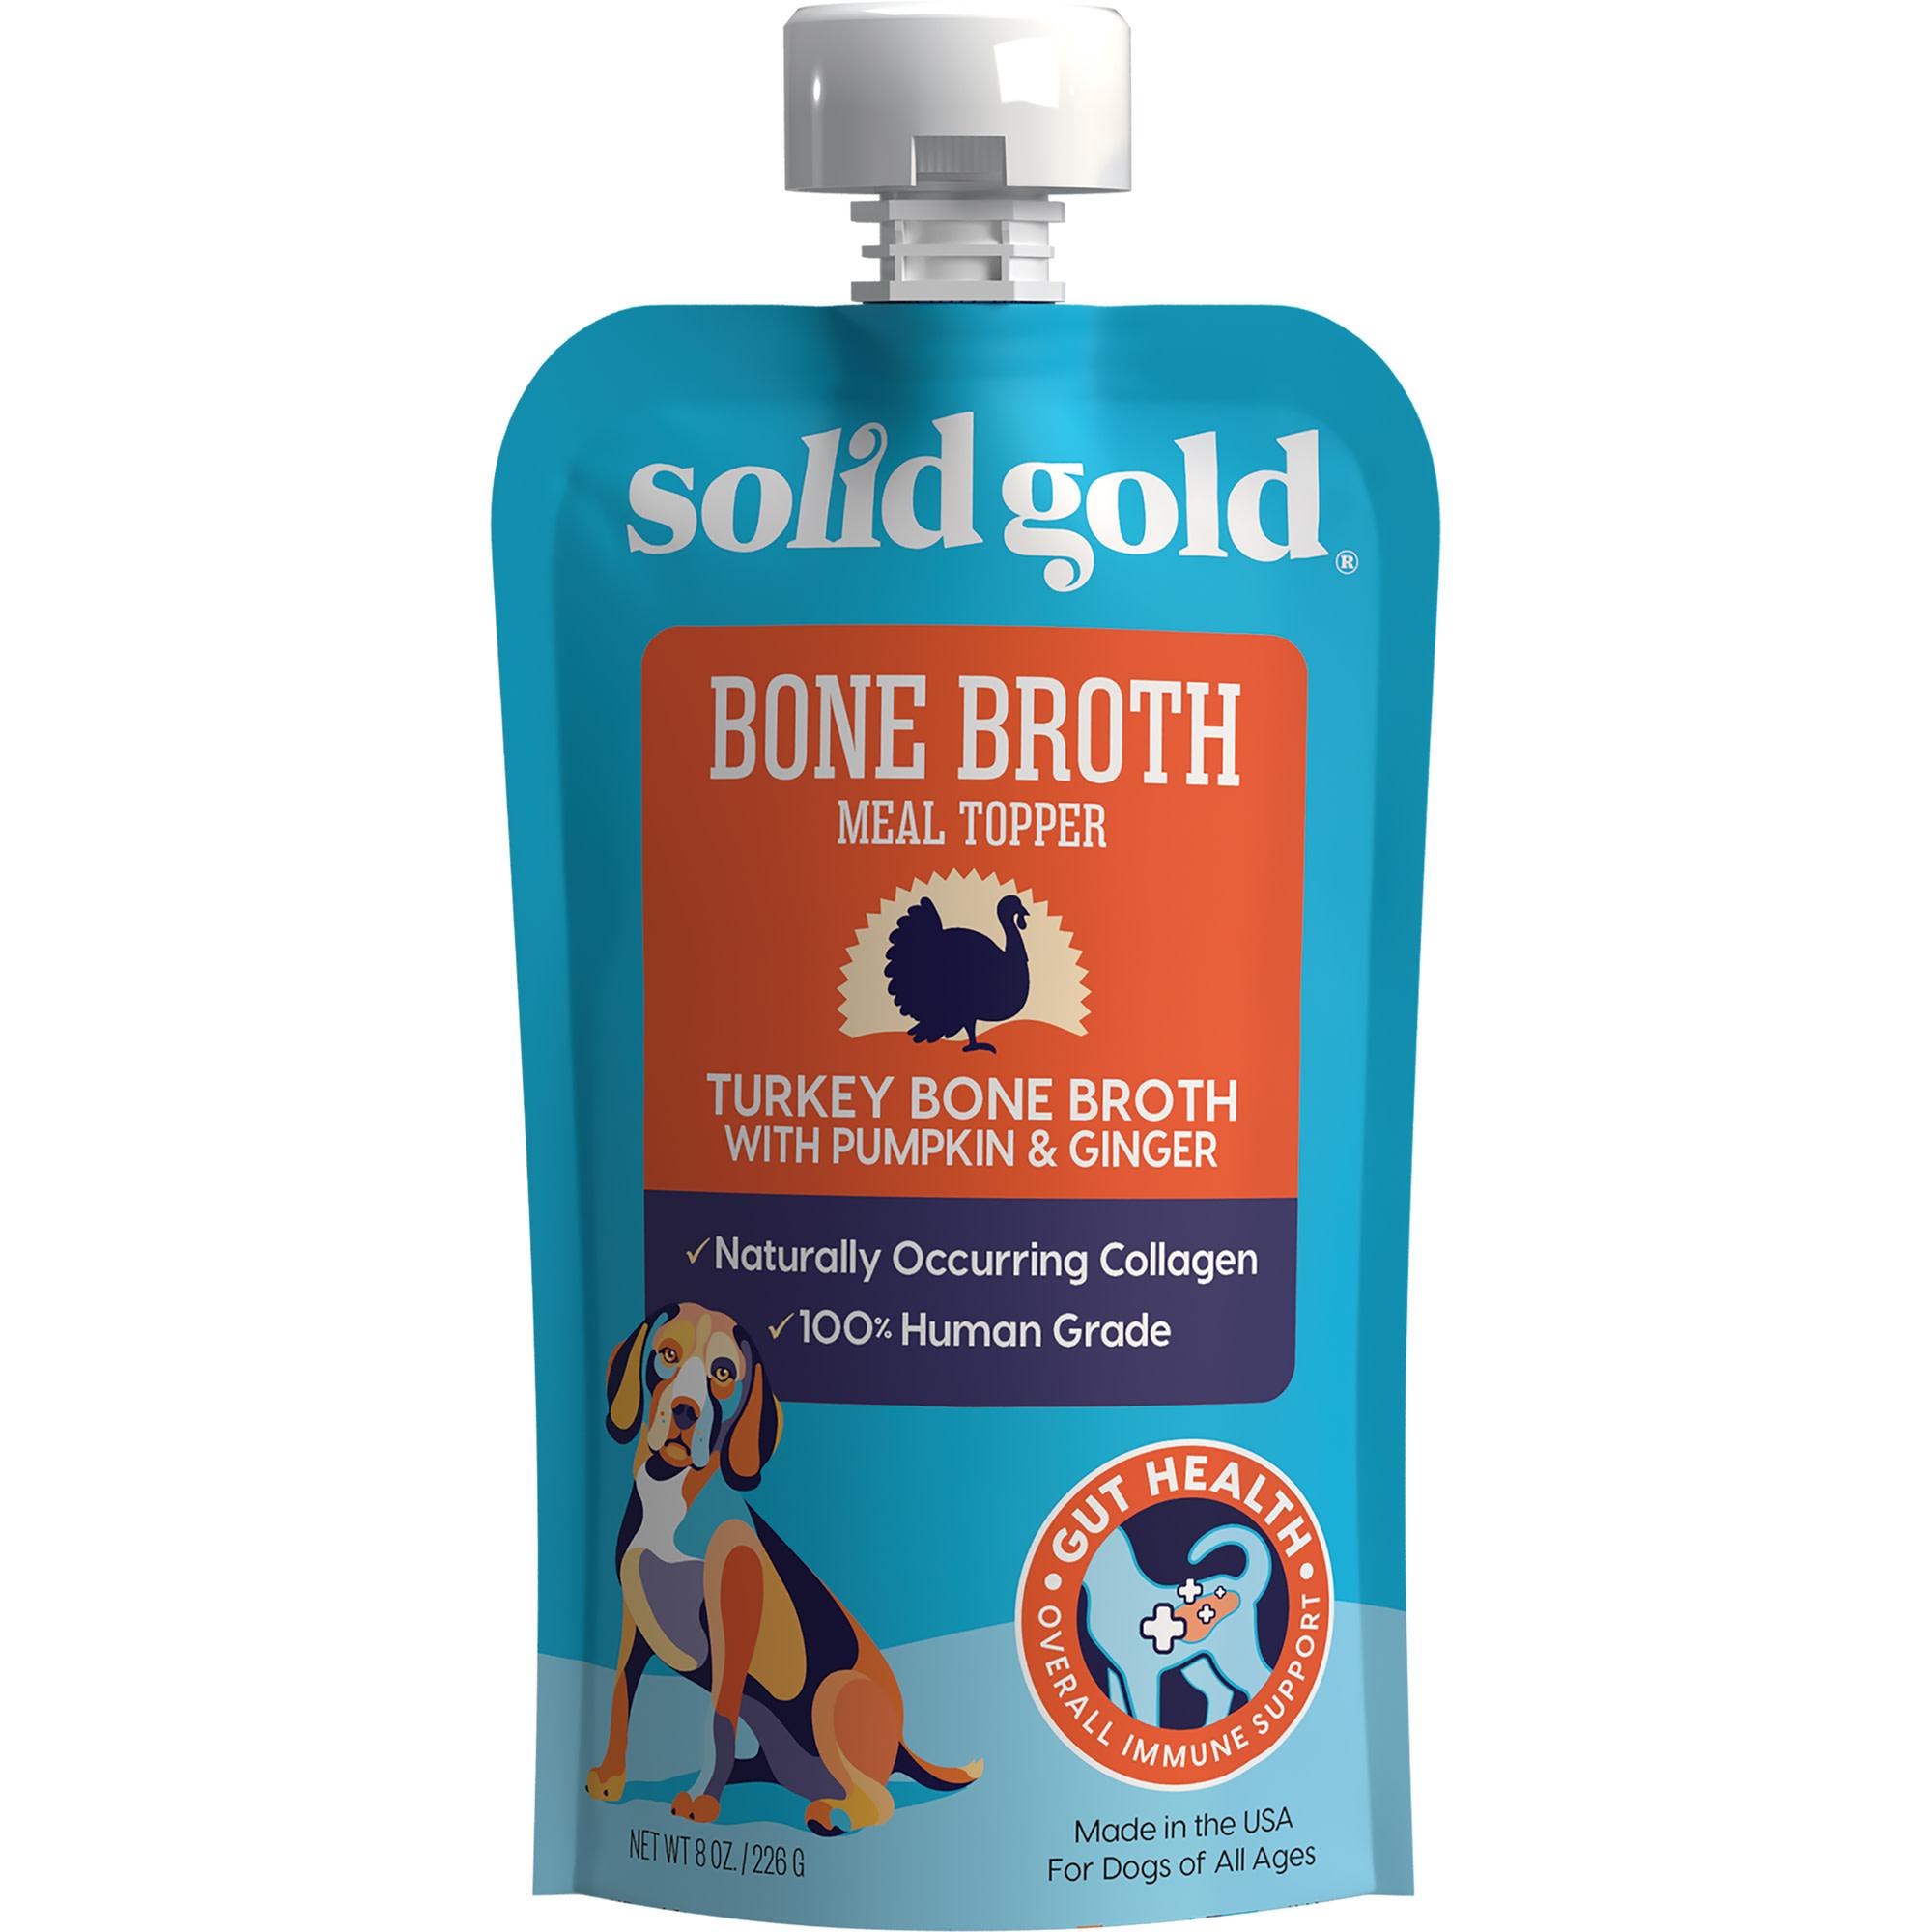 Solid Gold Turkey Bone Broth with